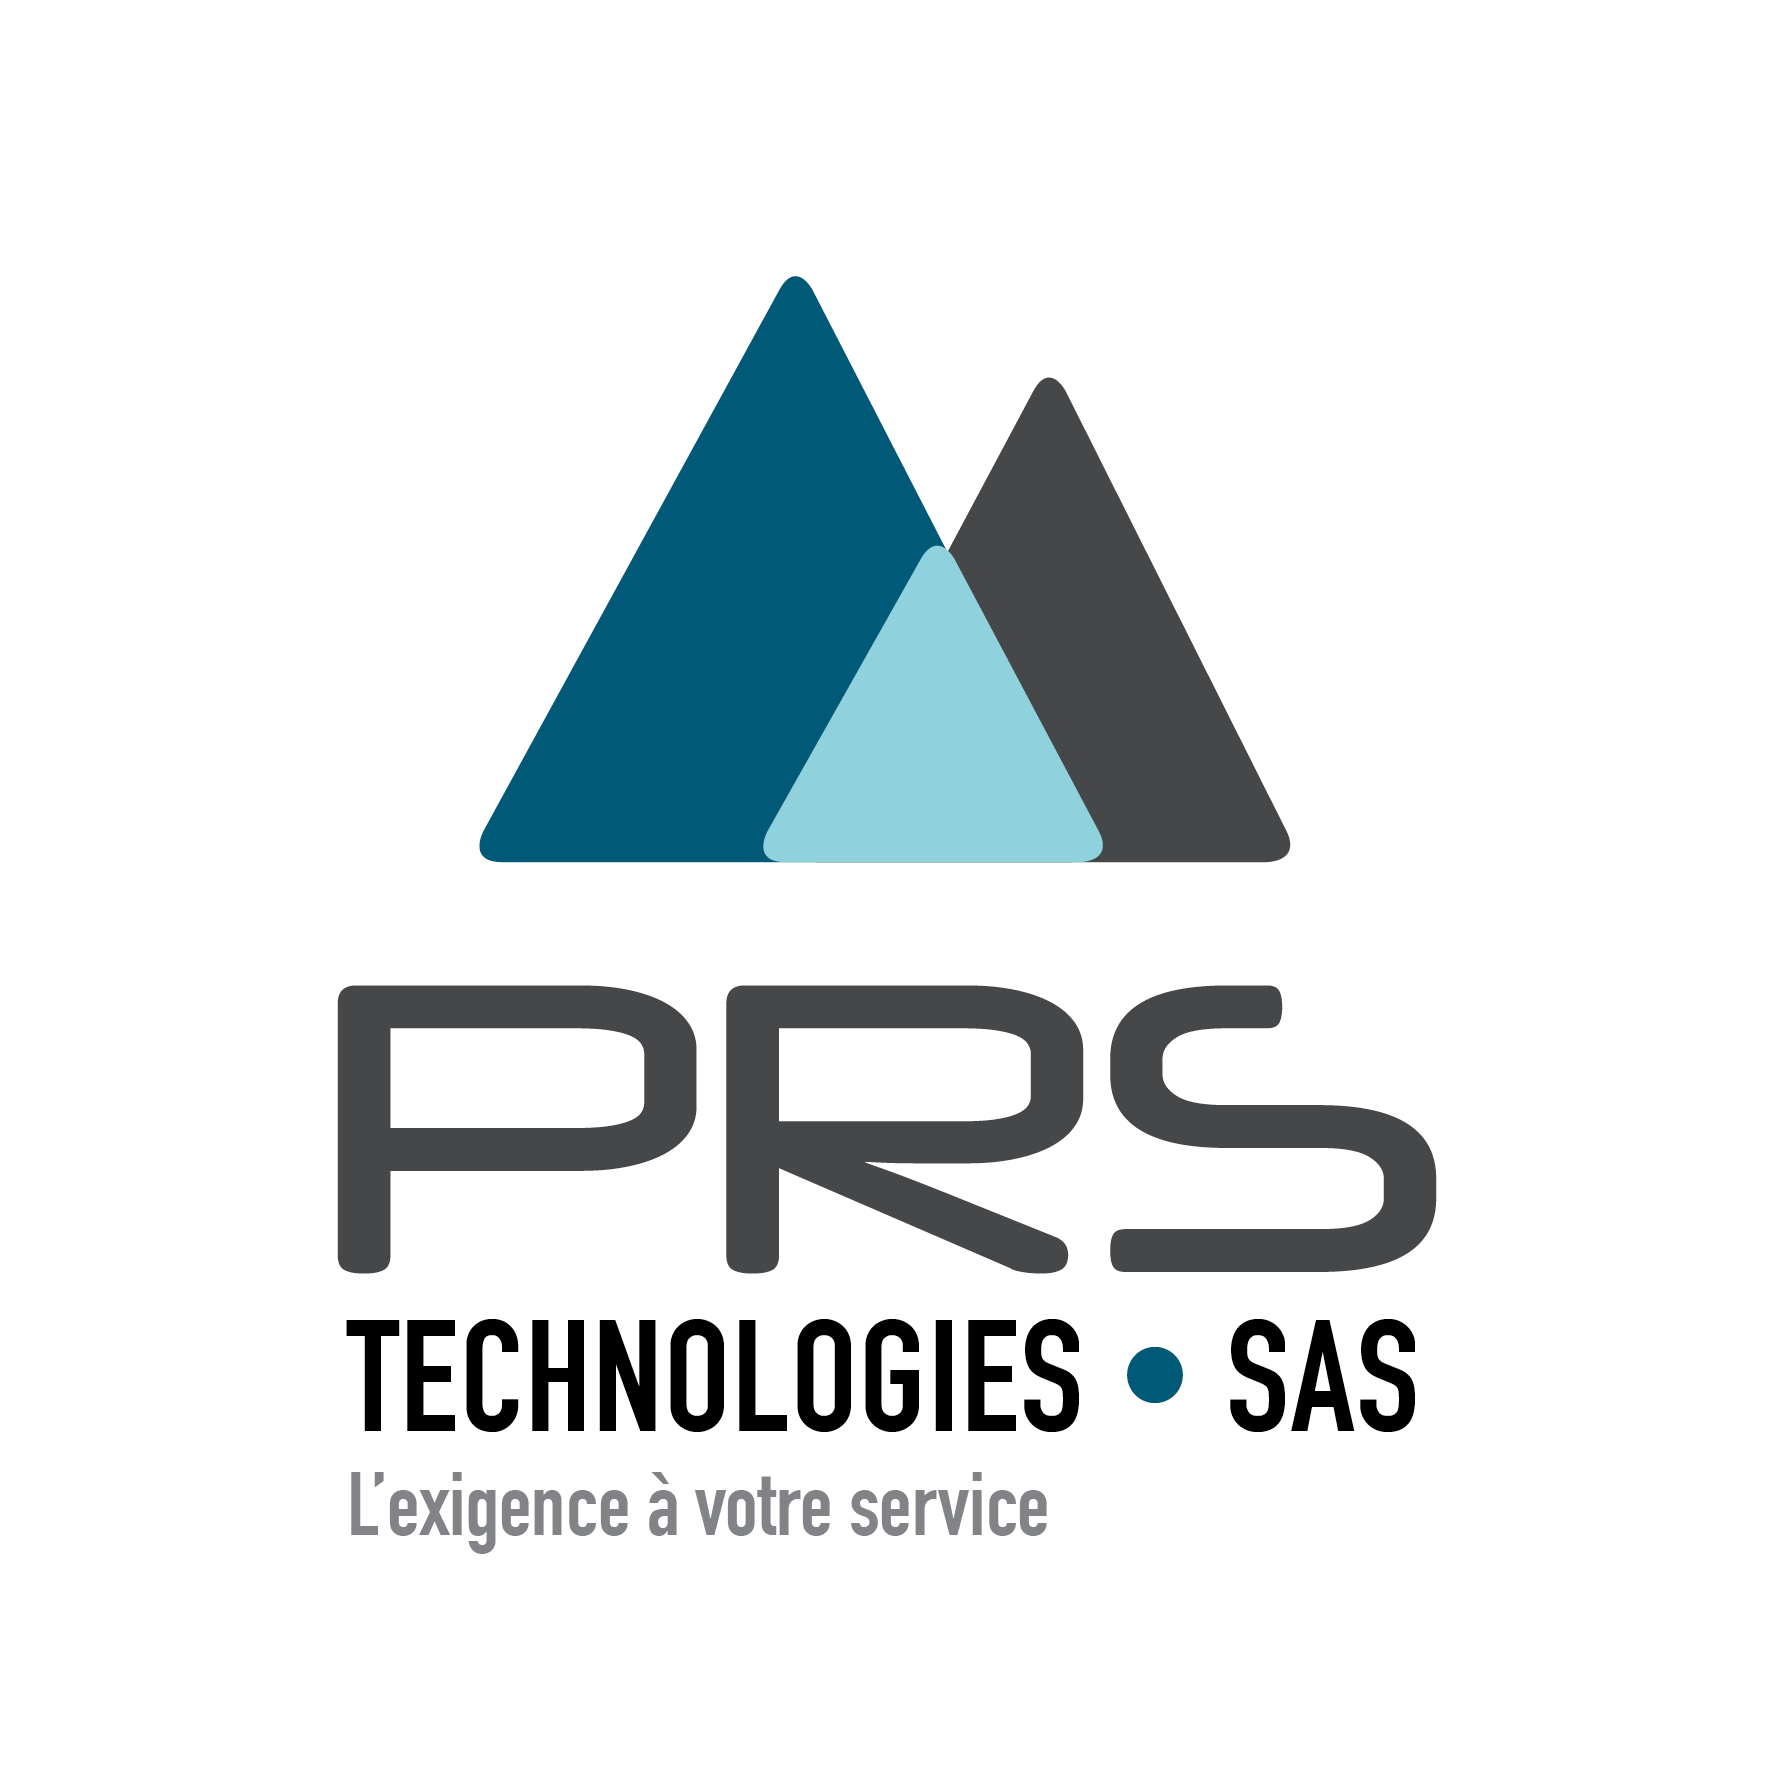 PRS TECHNOLOGIES, PRS (PRS TECHNOLOGIES)